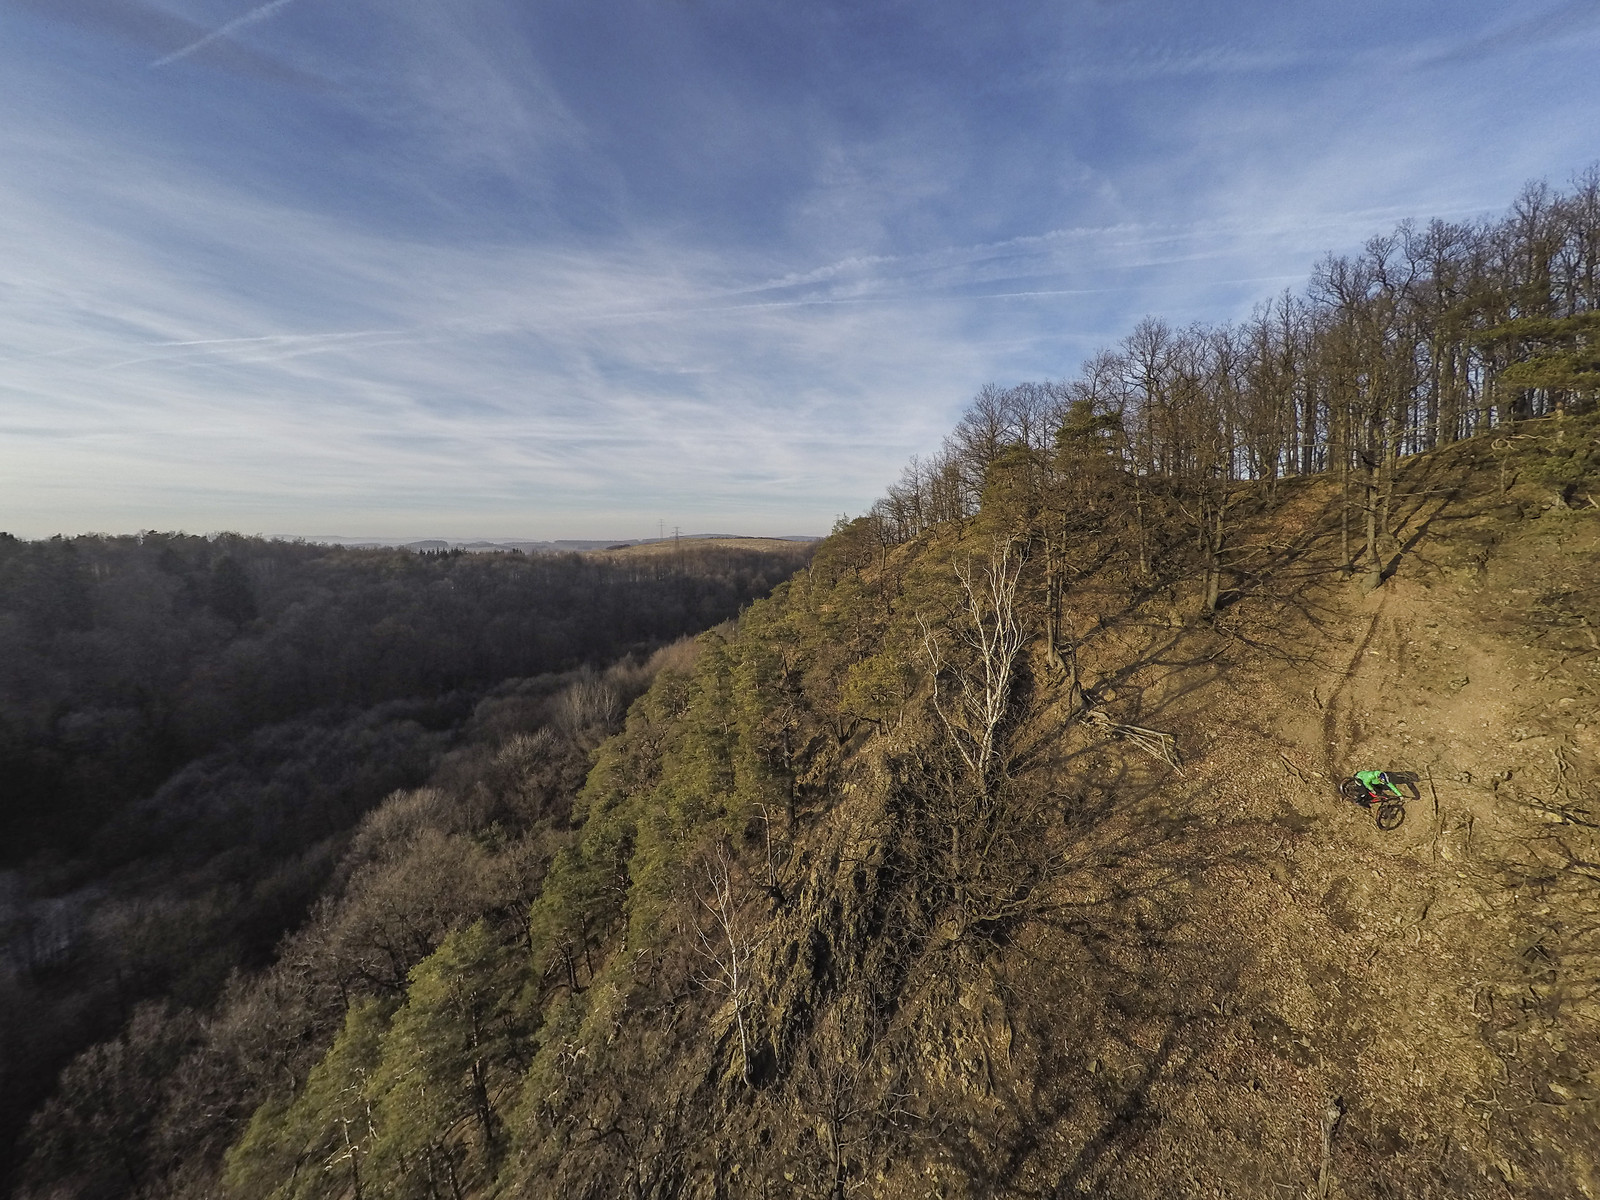 My dream chute - Piotr_Szwed Szwedowski - Mountain Biking Pictures - Vital MTB